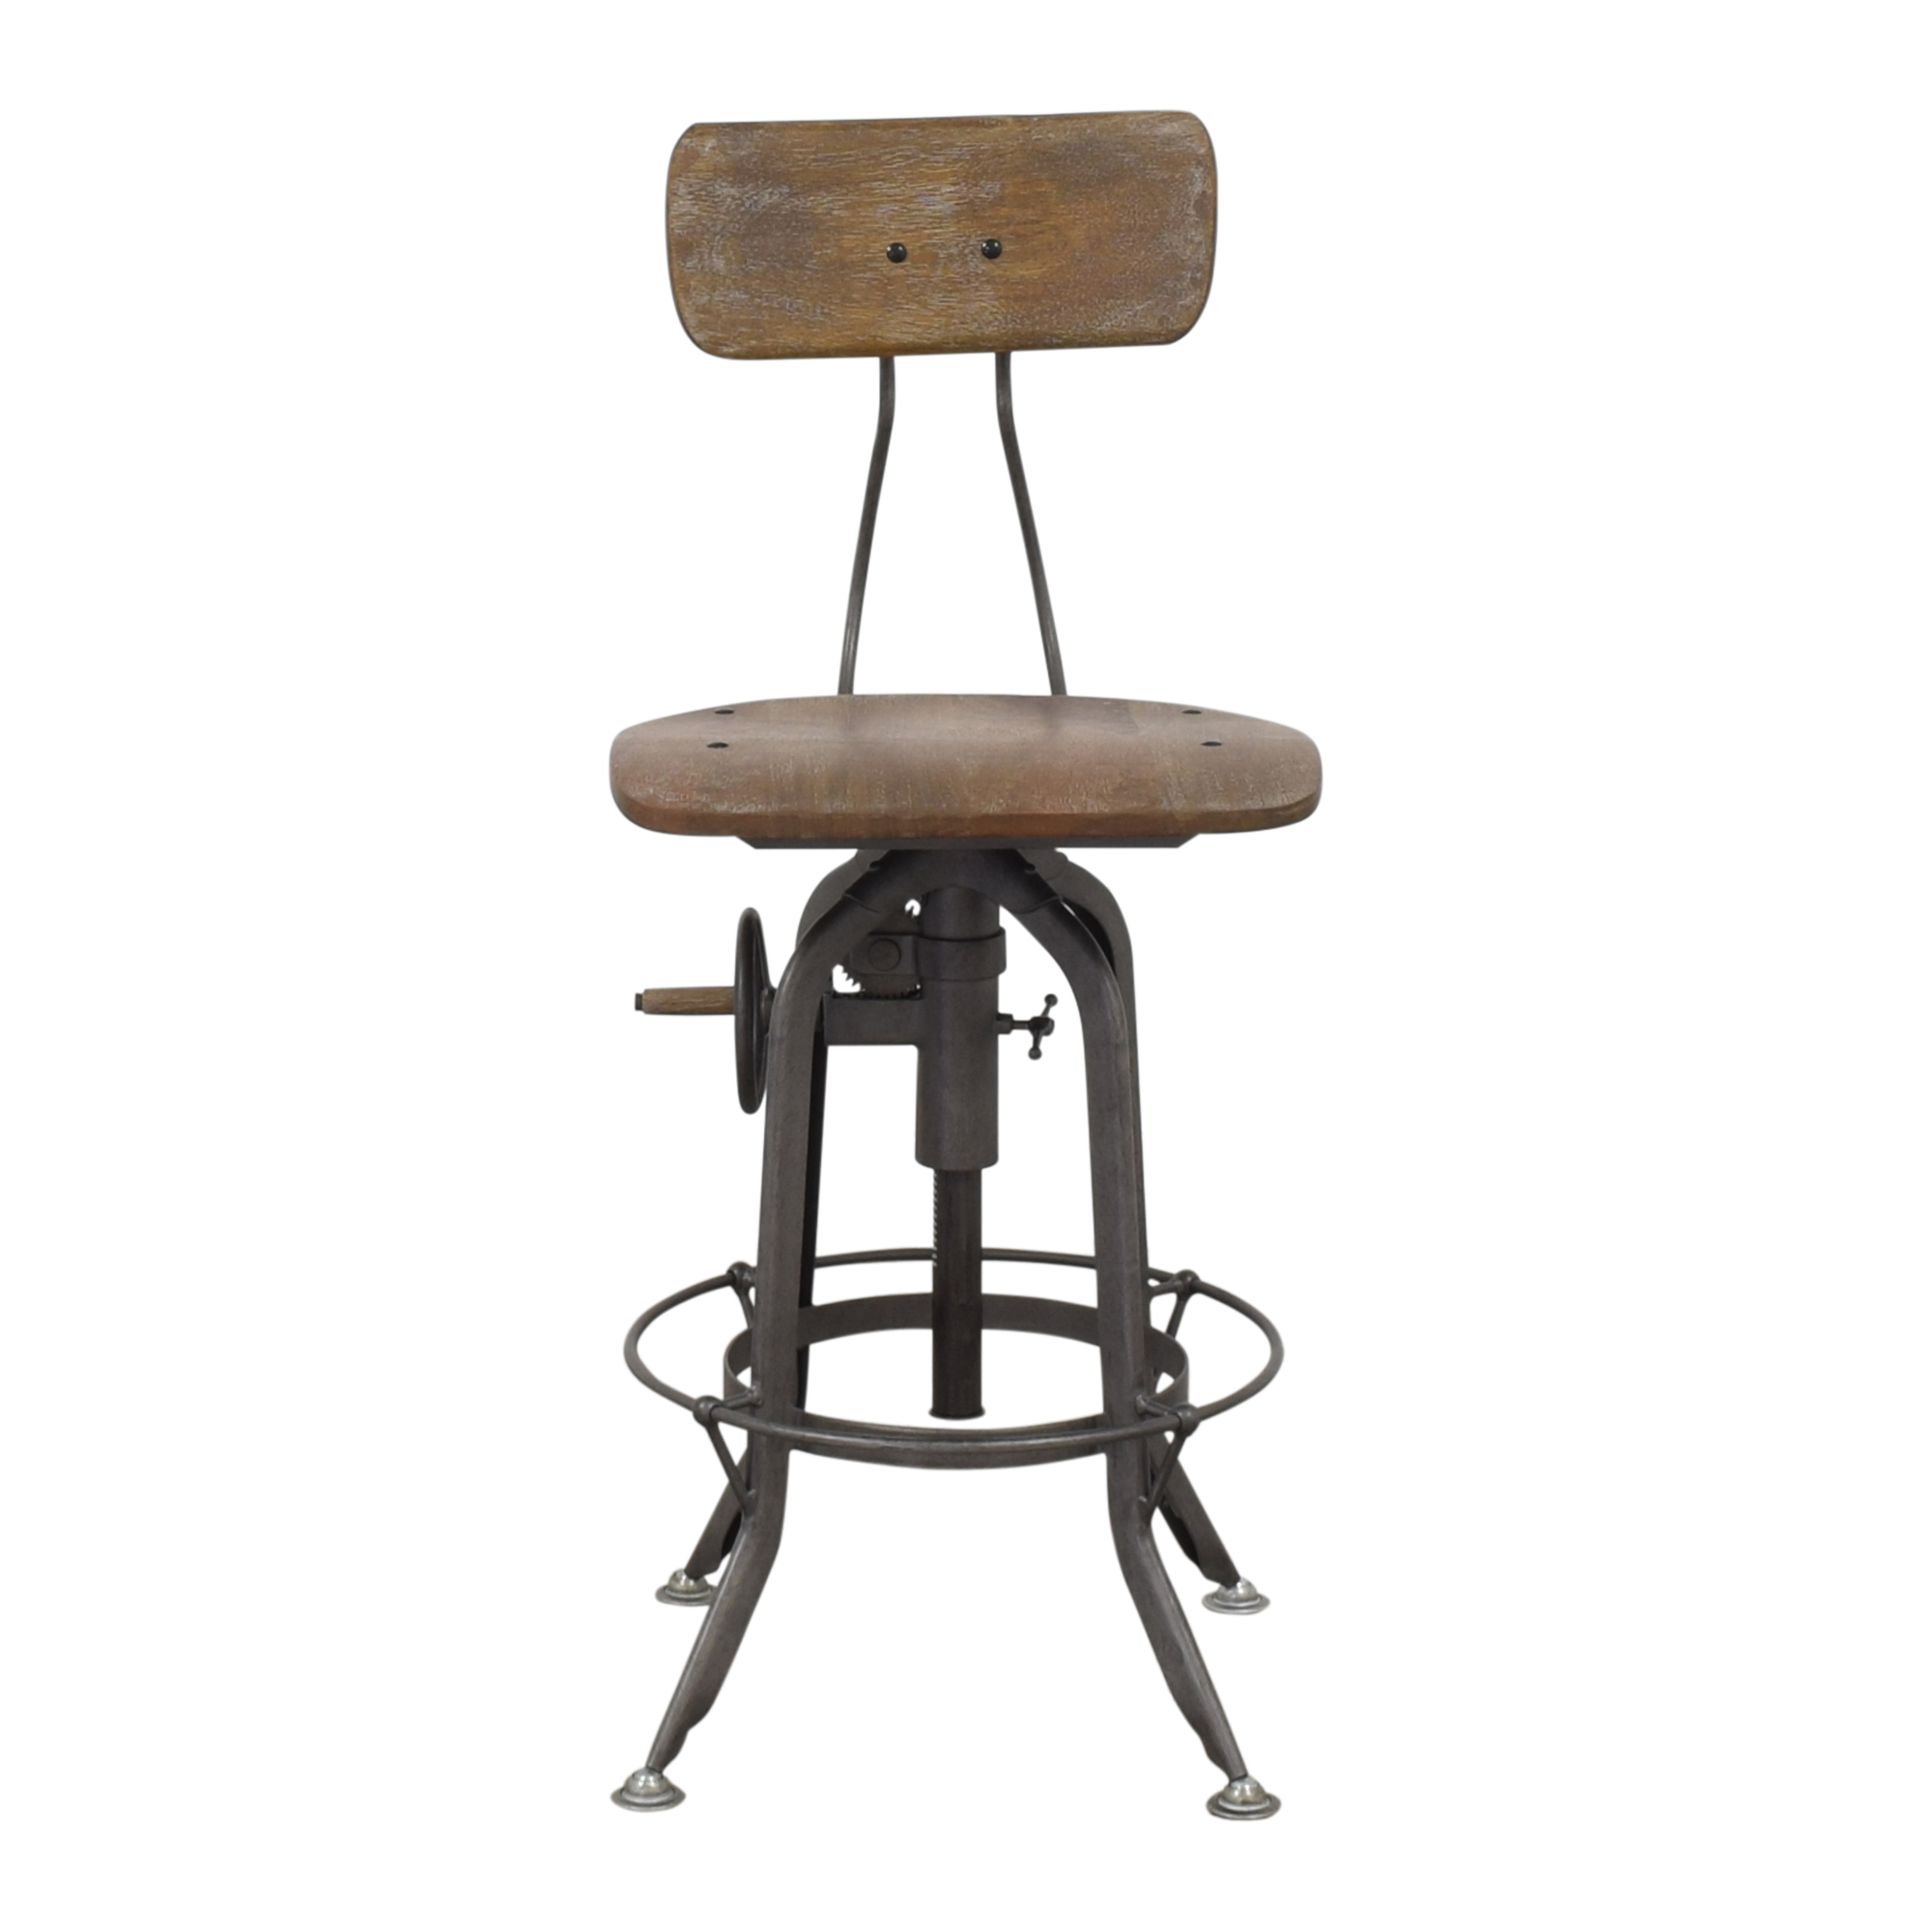 Pottery Barn Pottery Barn Pittsburgh Adjustable Height Swivel Chair nyc